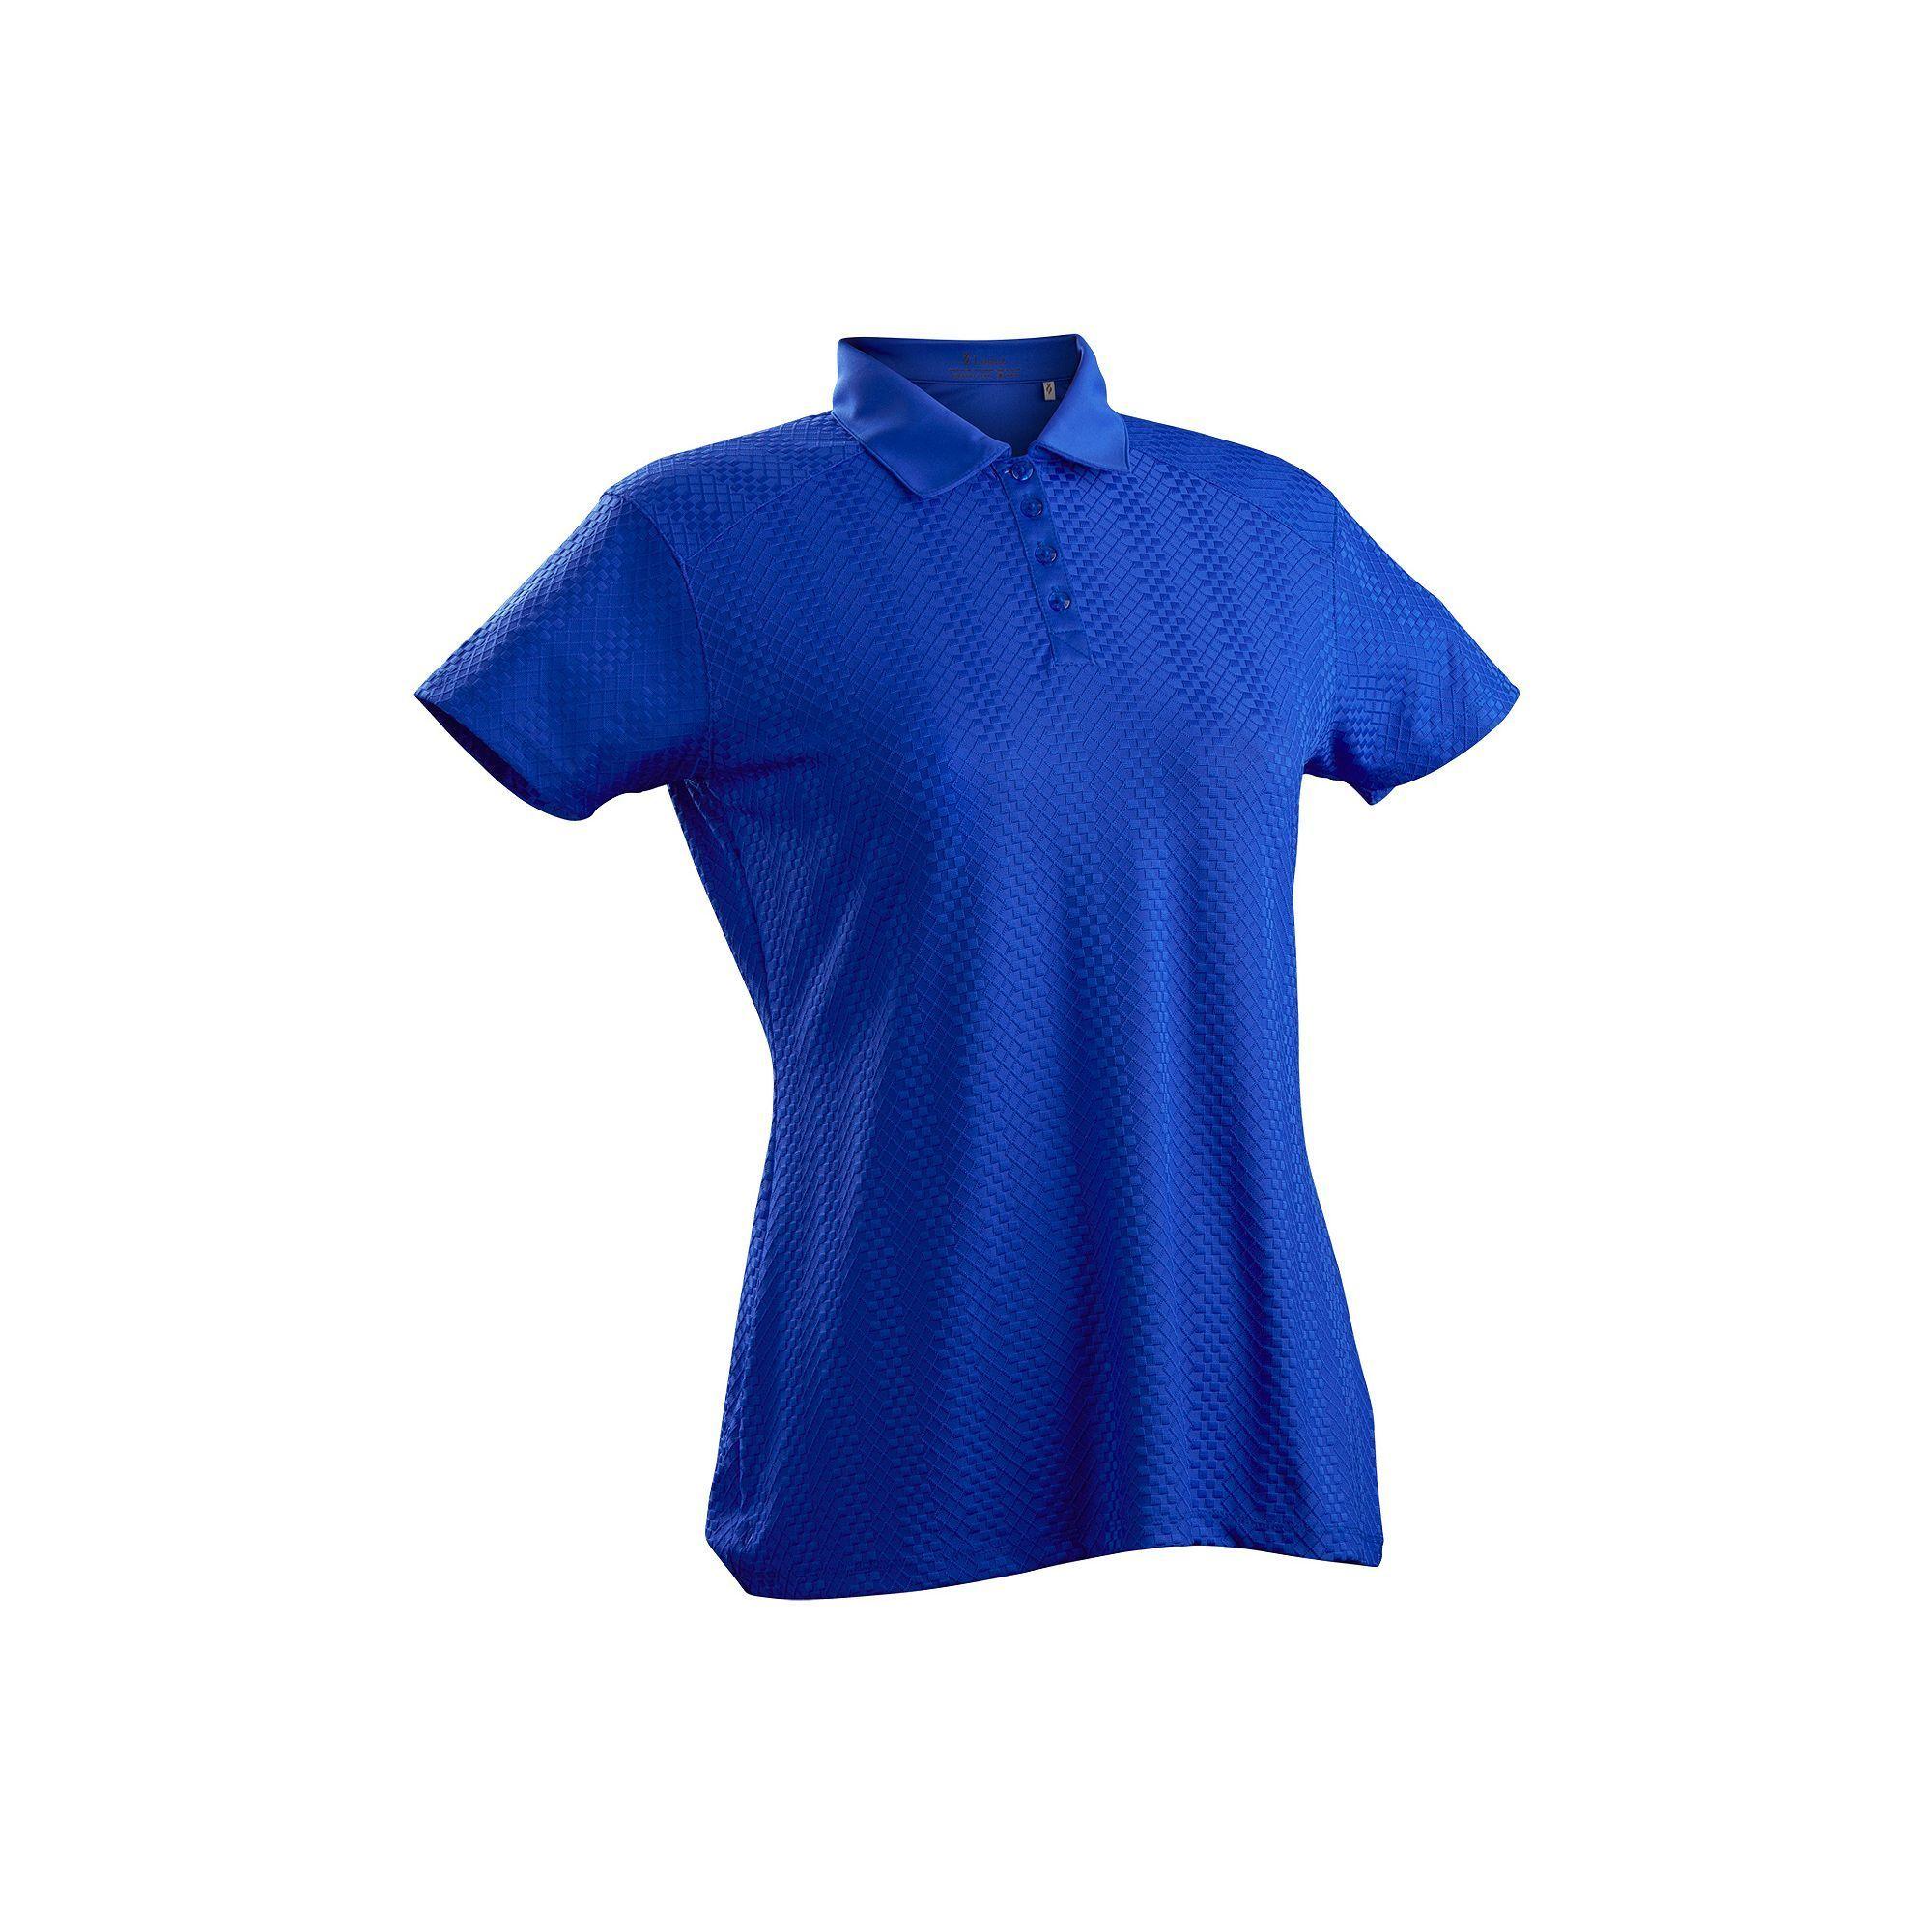 889a5eed604 Plus Size Nancy Lopez Grace Short Sleeve Golf Polo